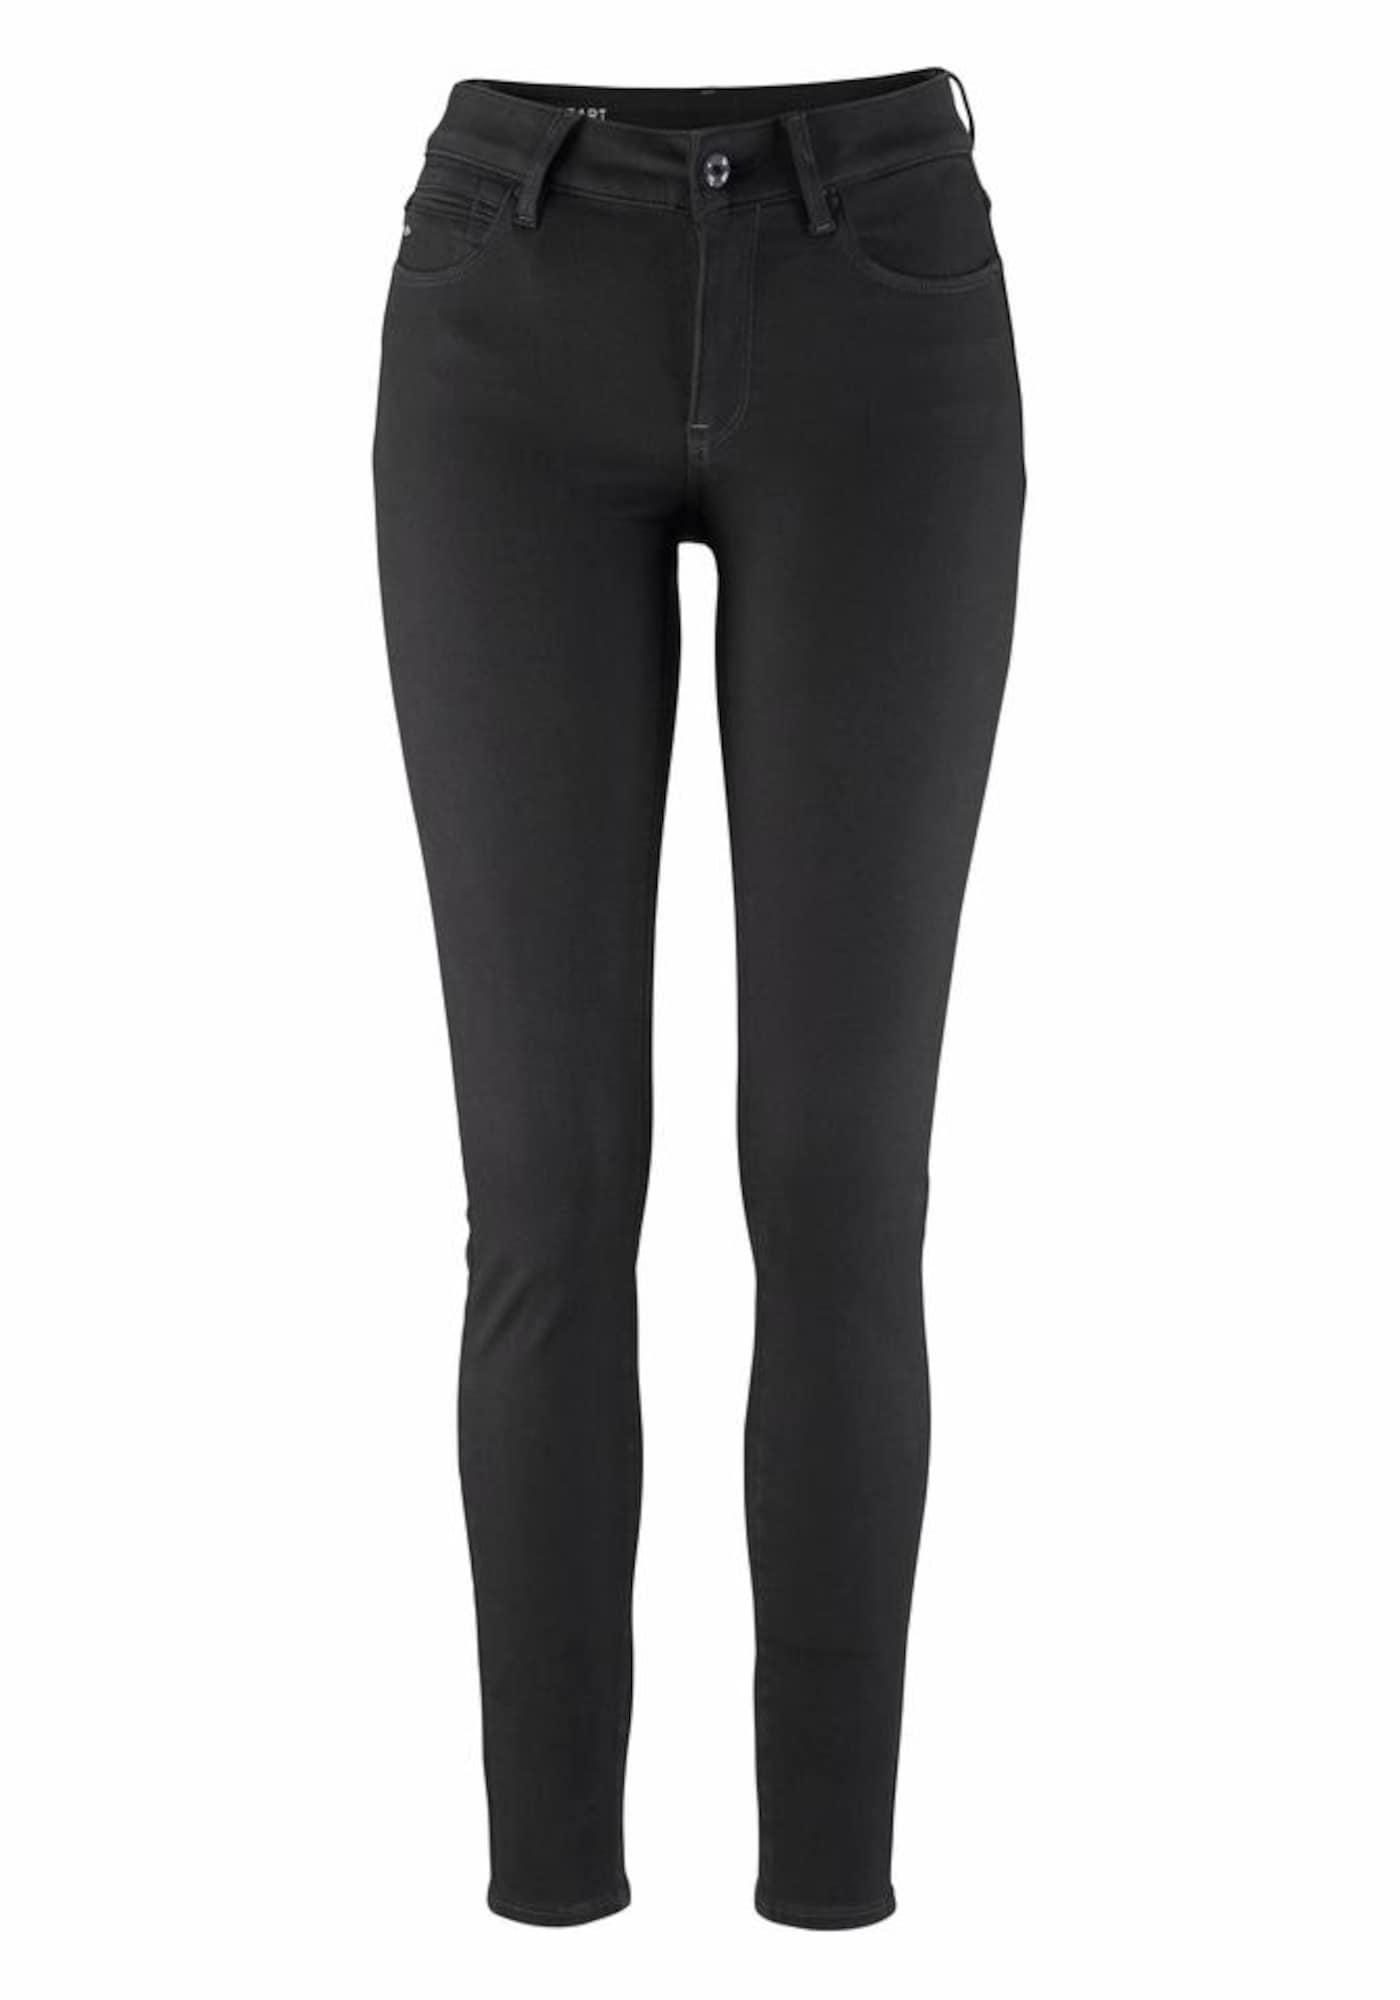 G-STAR RAW Dames Jeans Shape High Super Skinny zwart